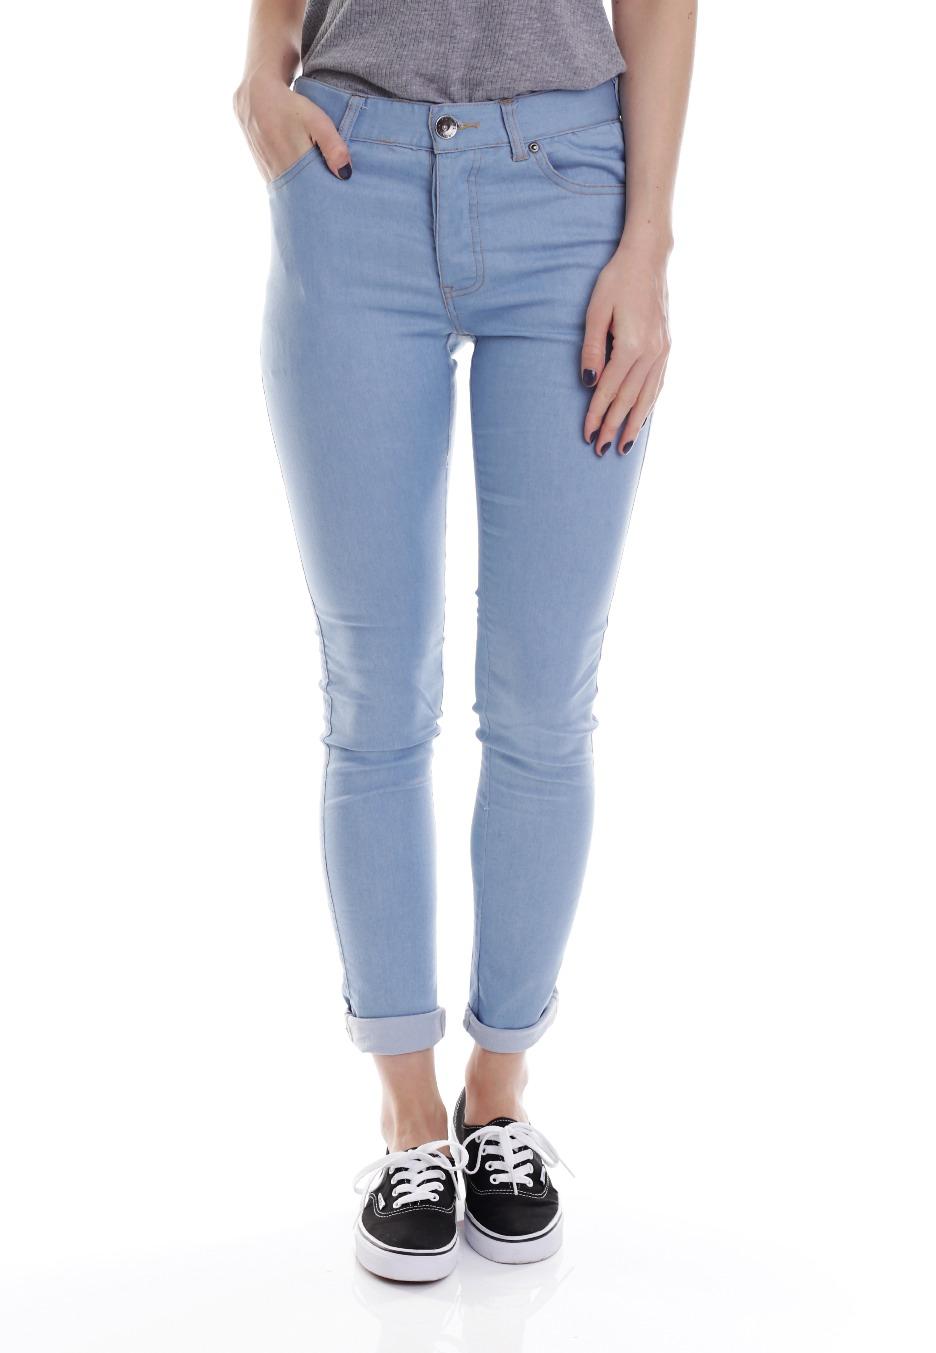 e421b1afb1e Ironnail - Perrin Skinny Light Blue - Jeans - Streetwear Shop -  Impericon.com AU